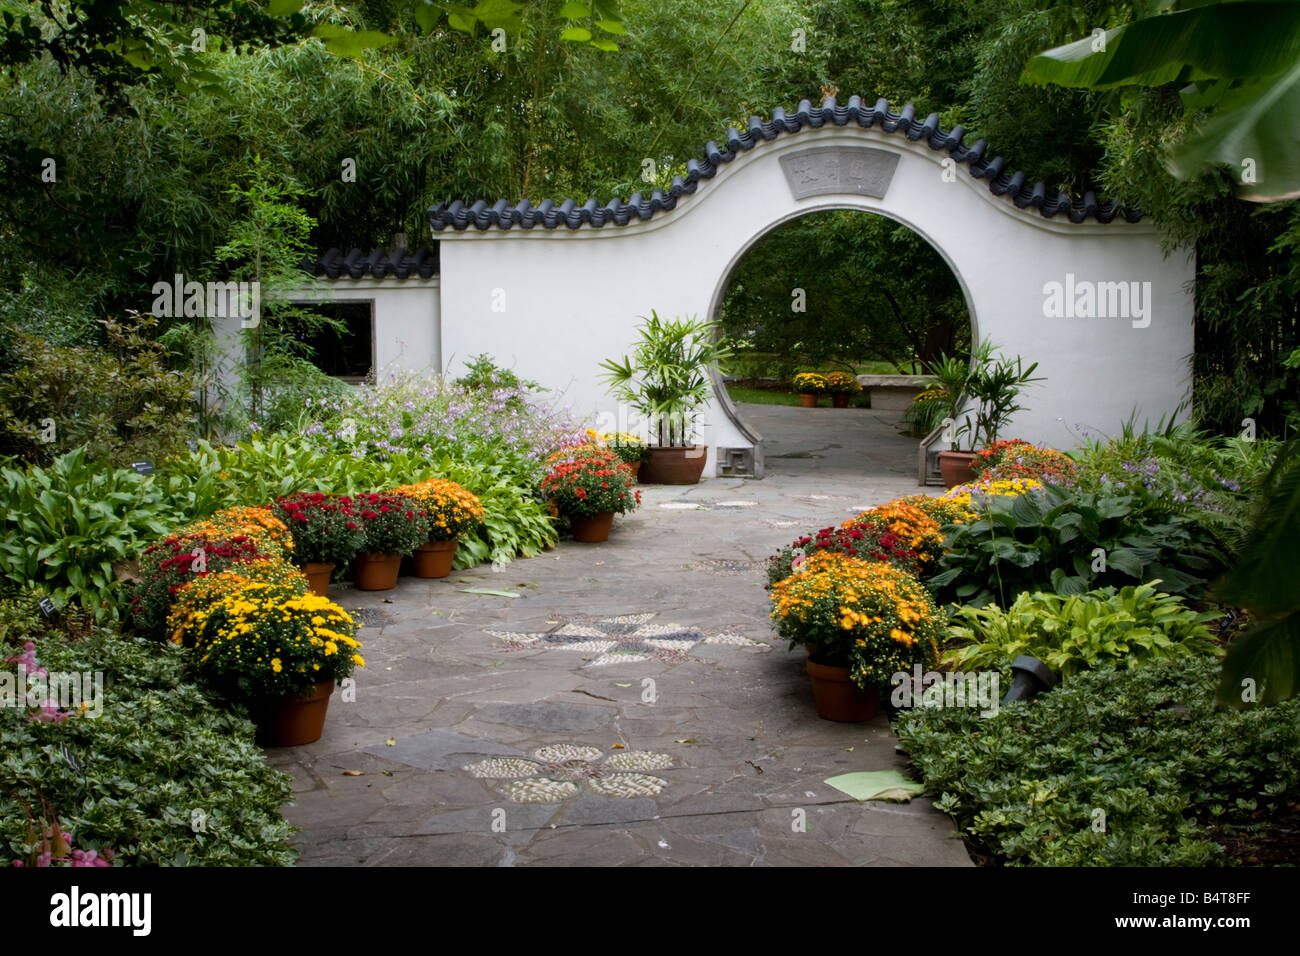 St. Louis, Missouri, USA. Chinese Garden, Missouri Botanical Garden,  Nanjing Friendship Garden With Moon Gate.